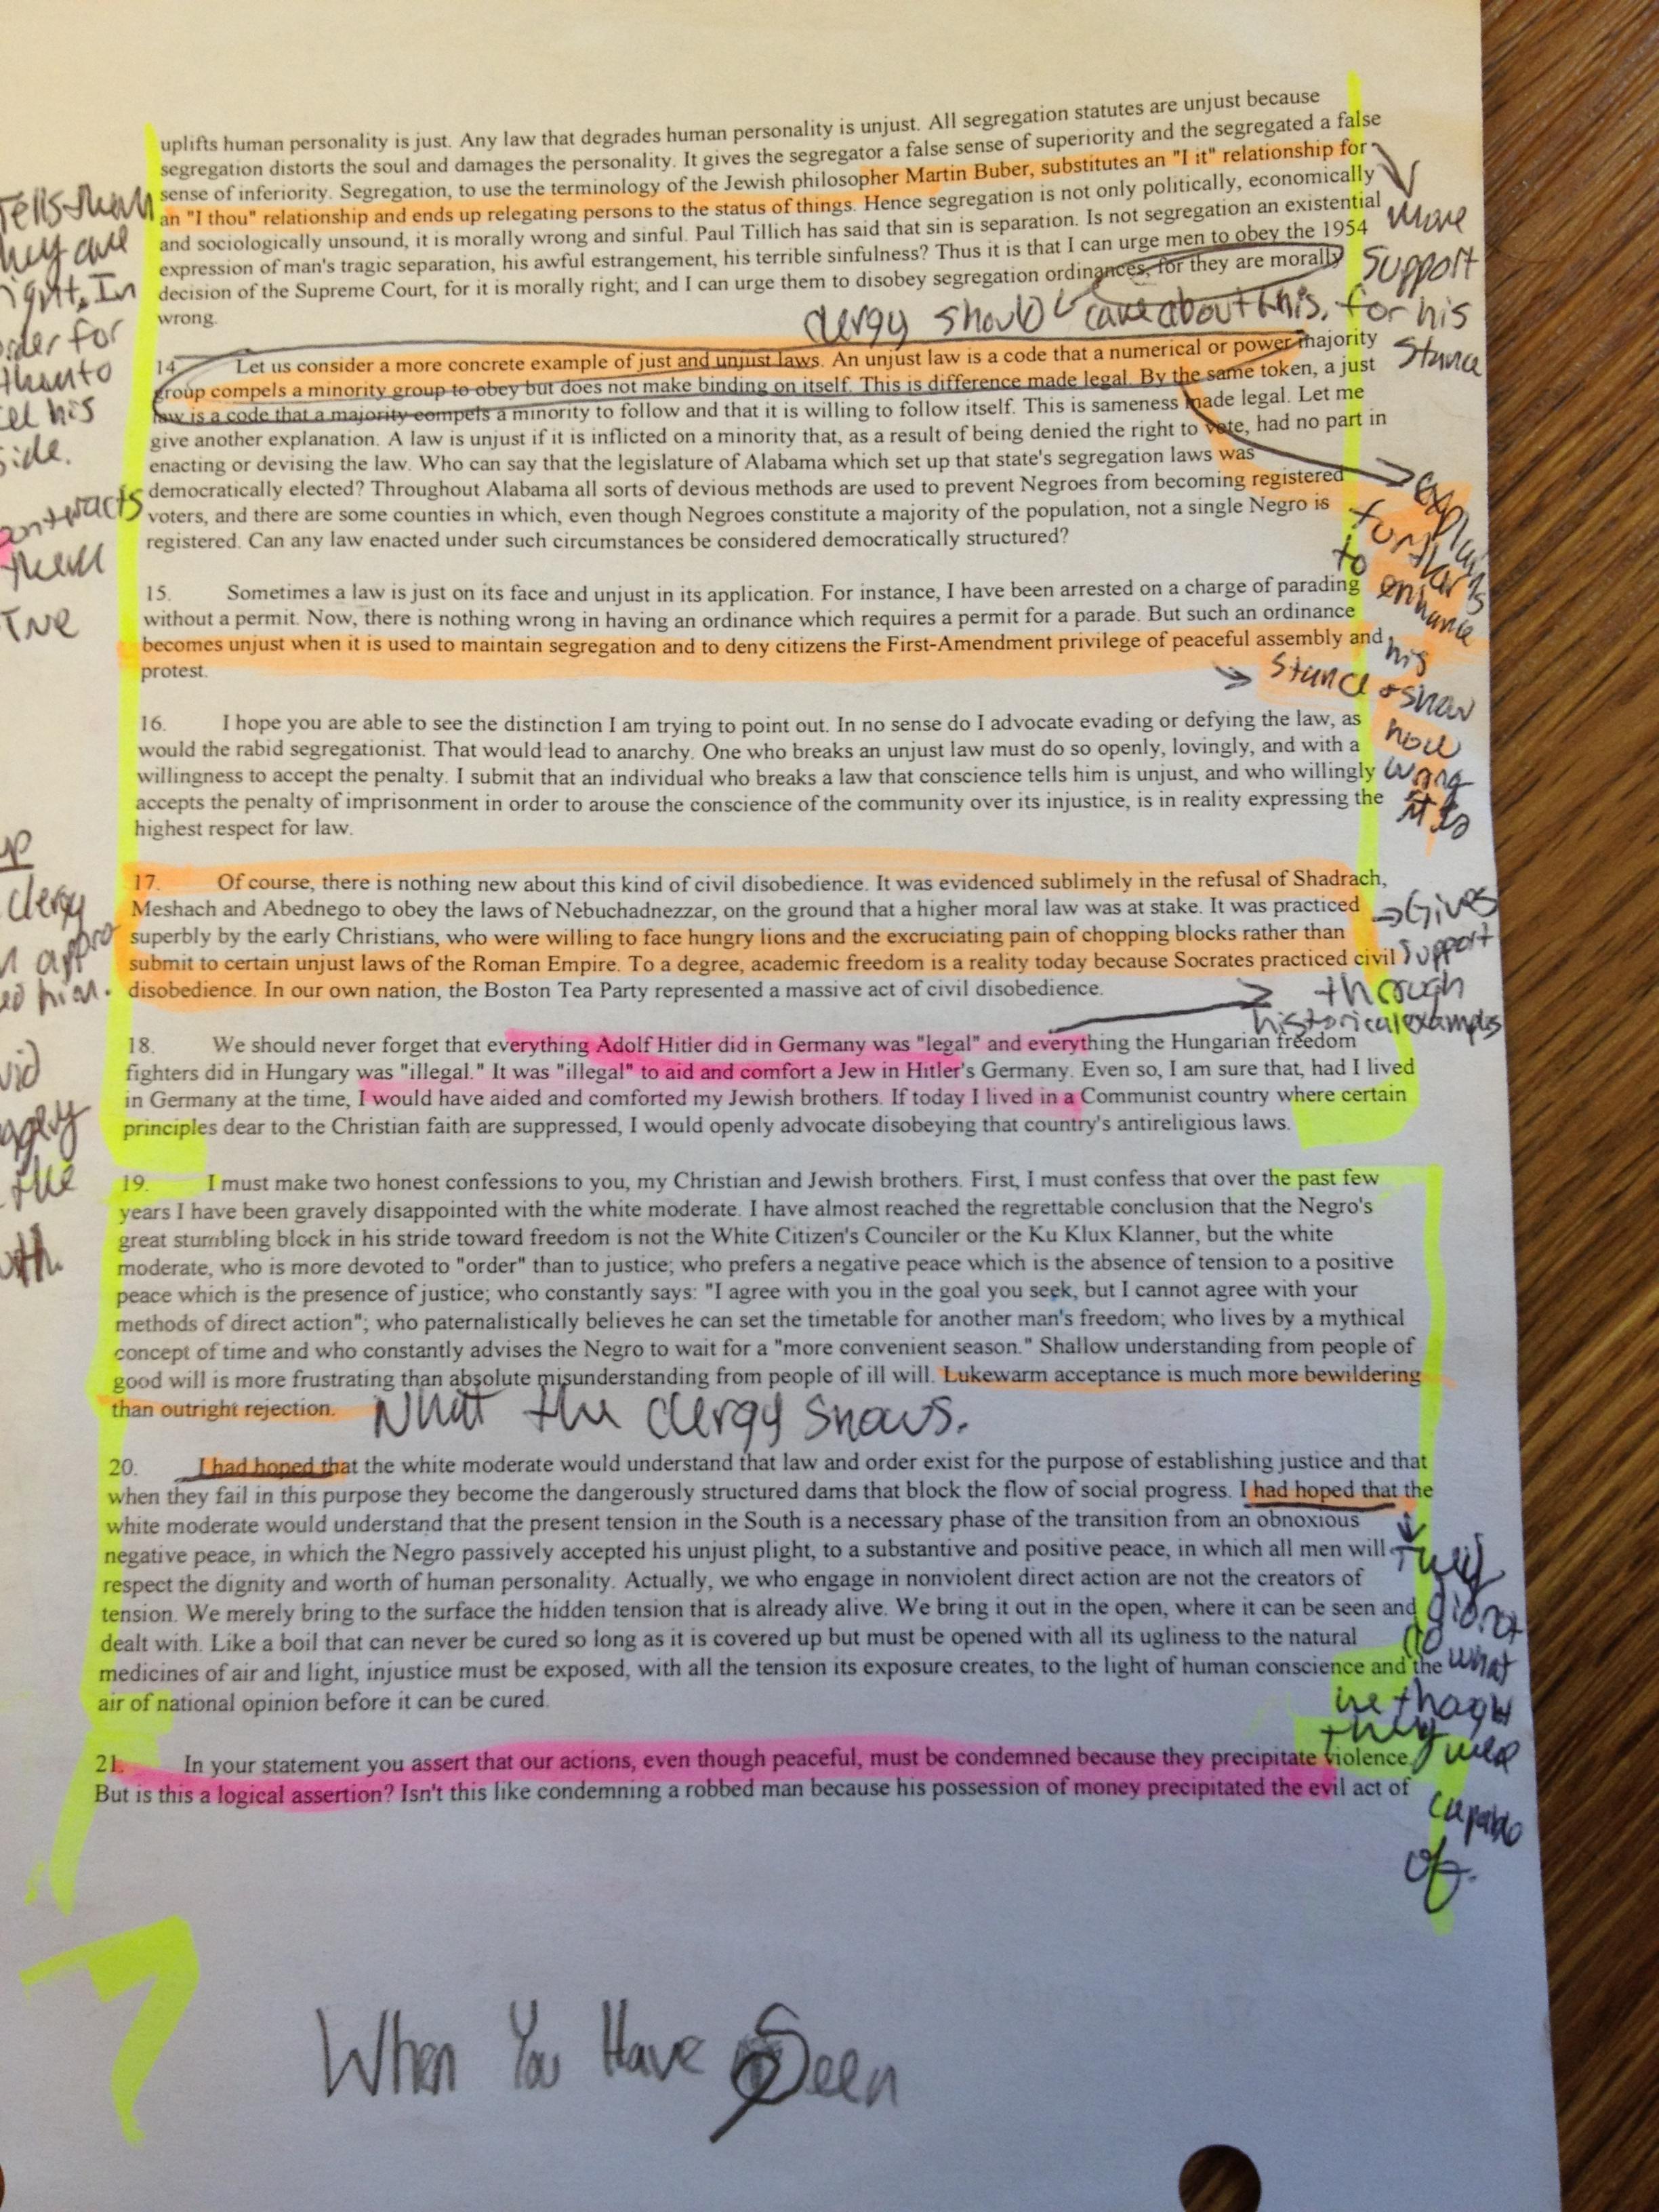 008 Essay Example Letter From Birmingham Jail Ethos Pathos Logos